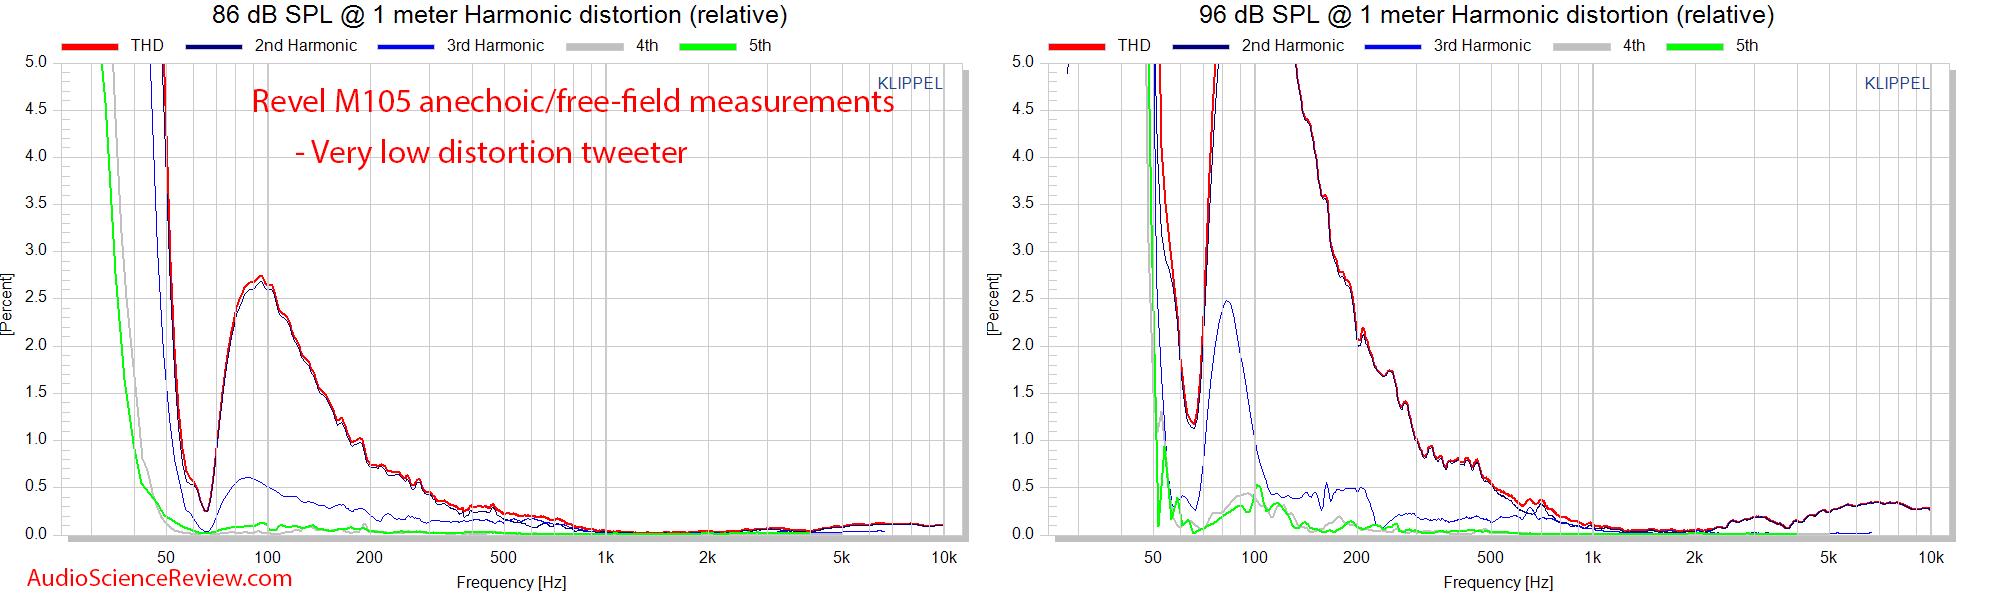 Revel M105 bookshelf speaker Distortion THD Relative Measurements Audio Measurements.png